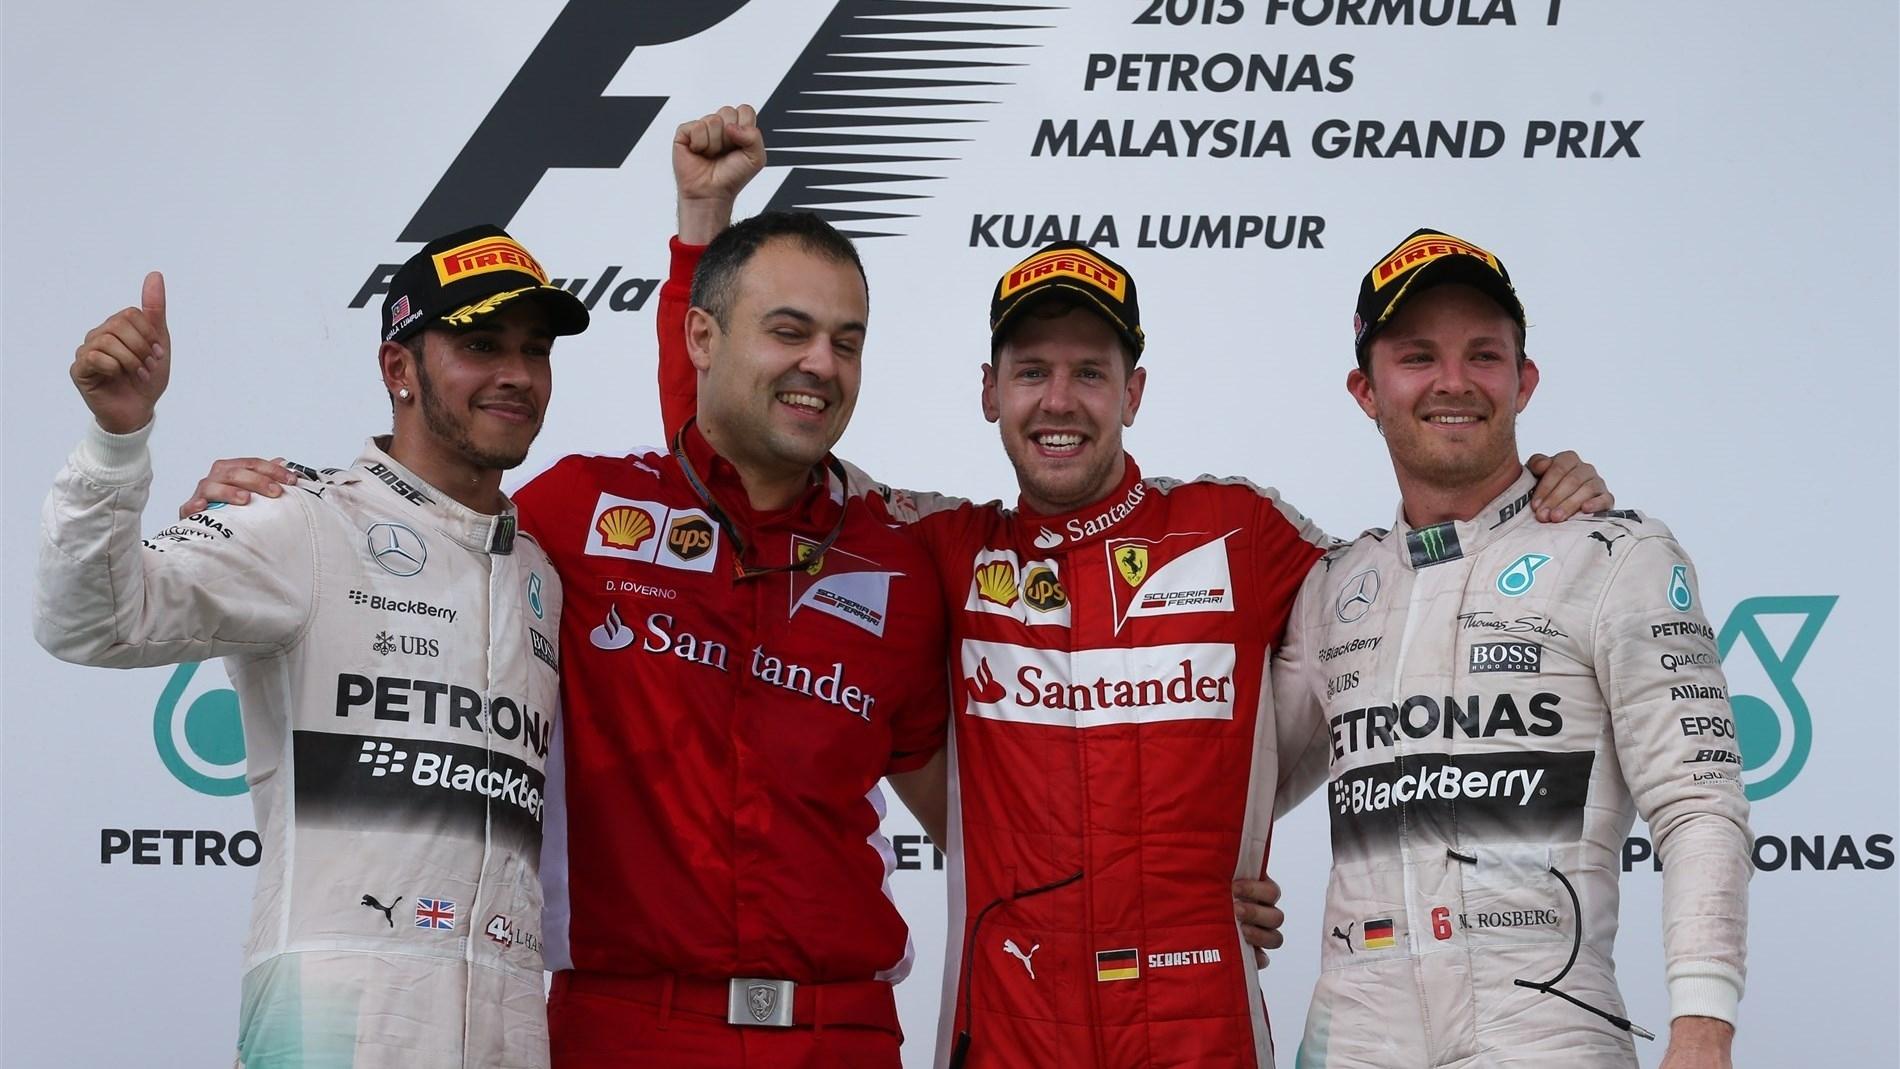 Winner Malaysian Grand Prix 2016 F Malaysia Podium